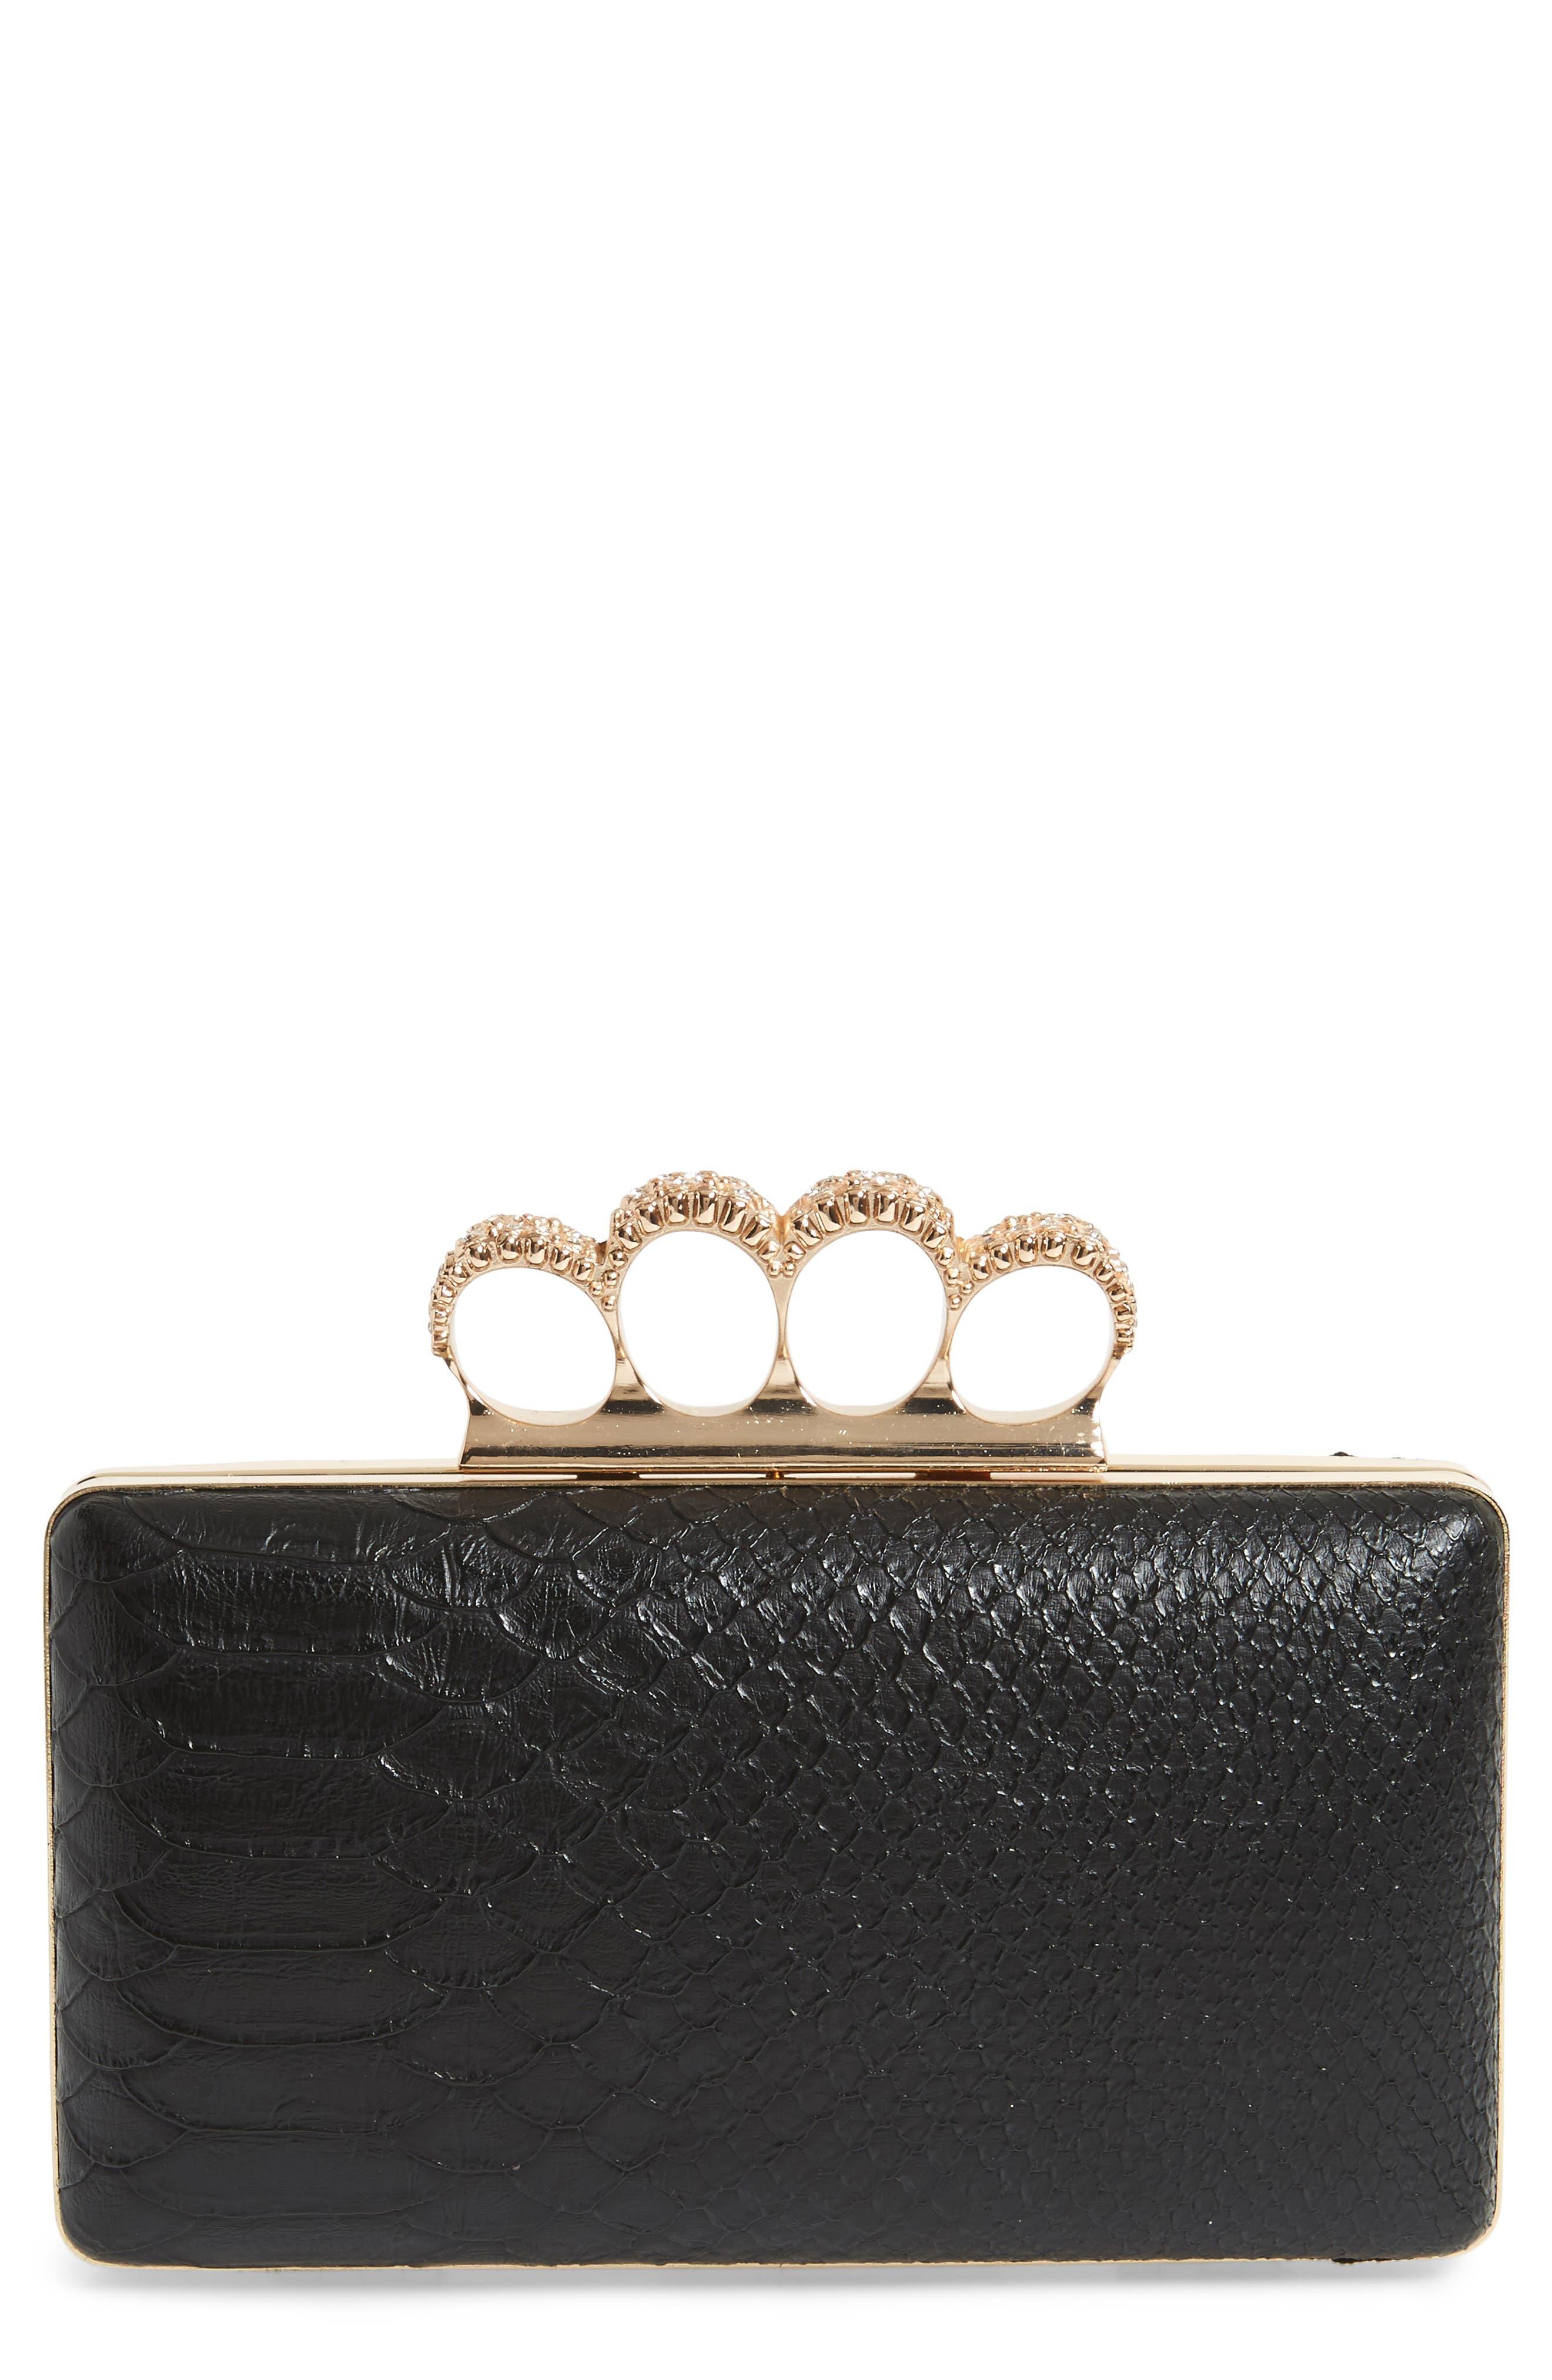 Natasha Couture Knuckle Box Clutch